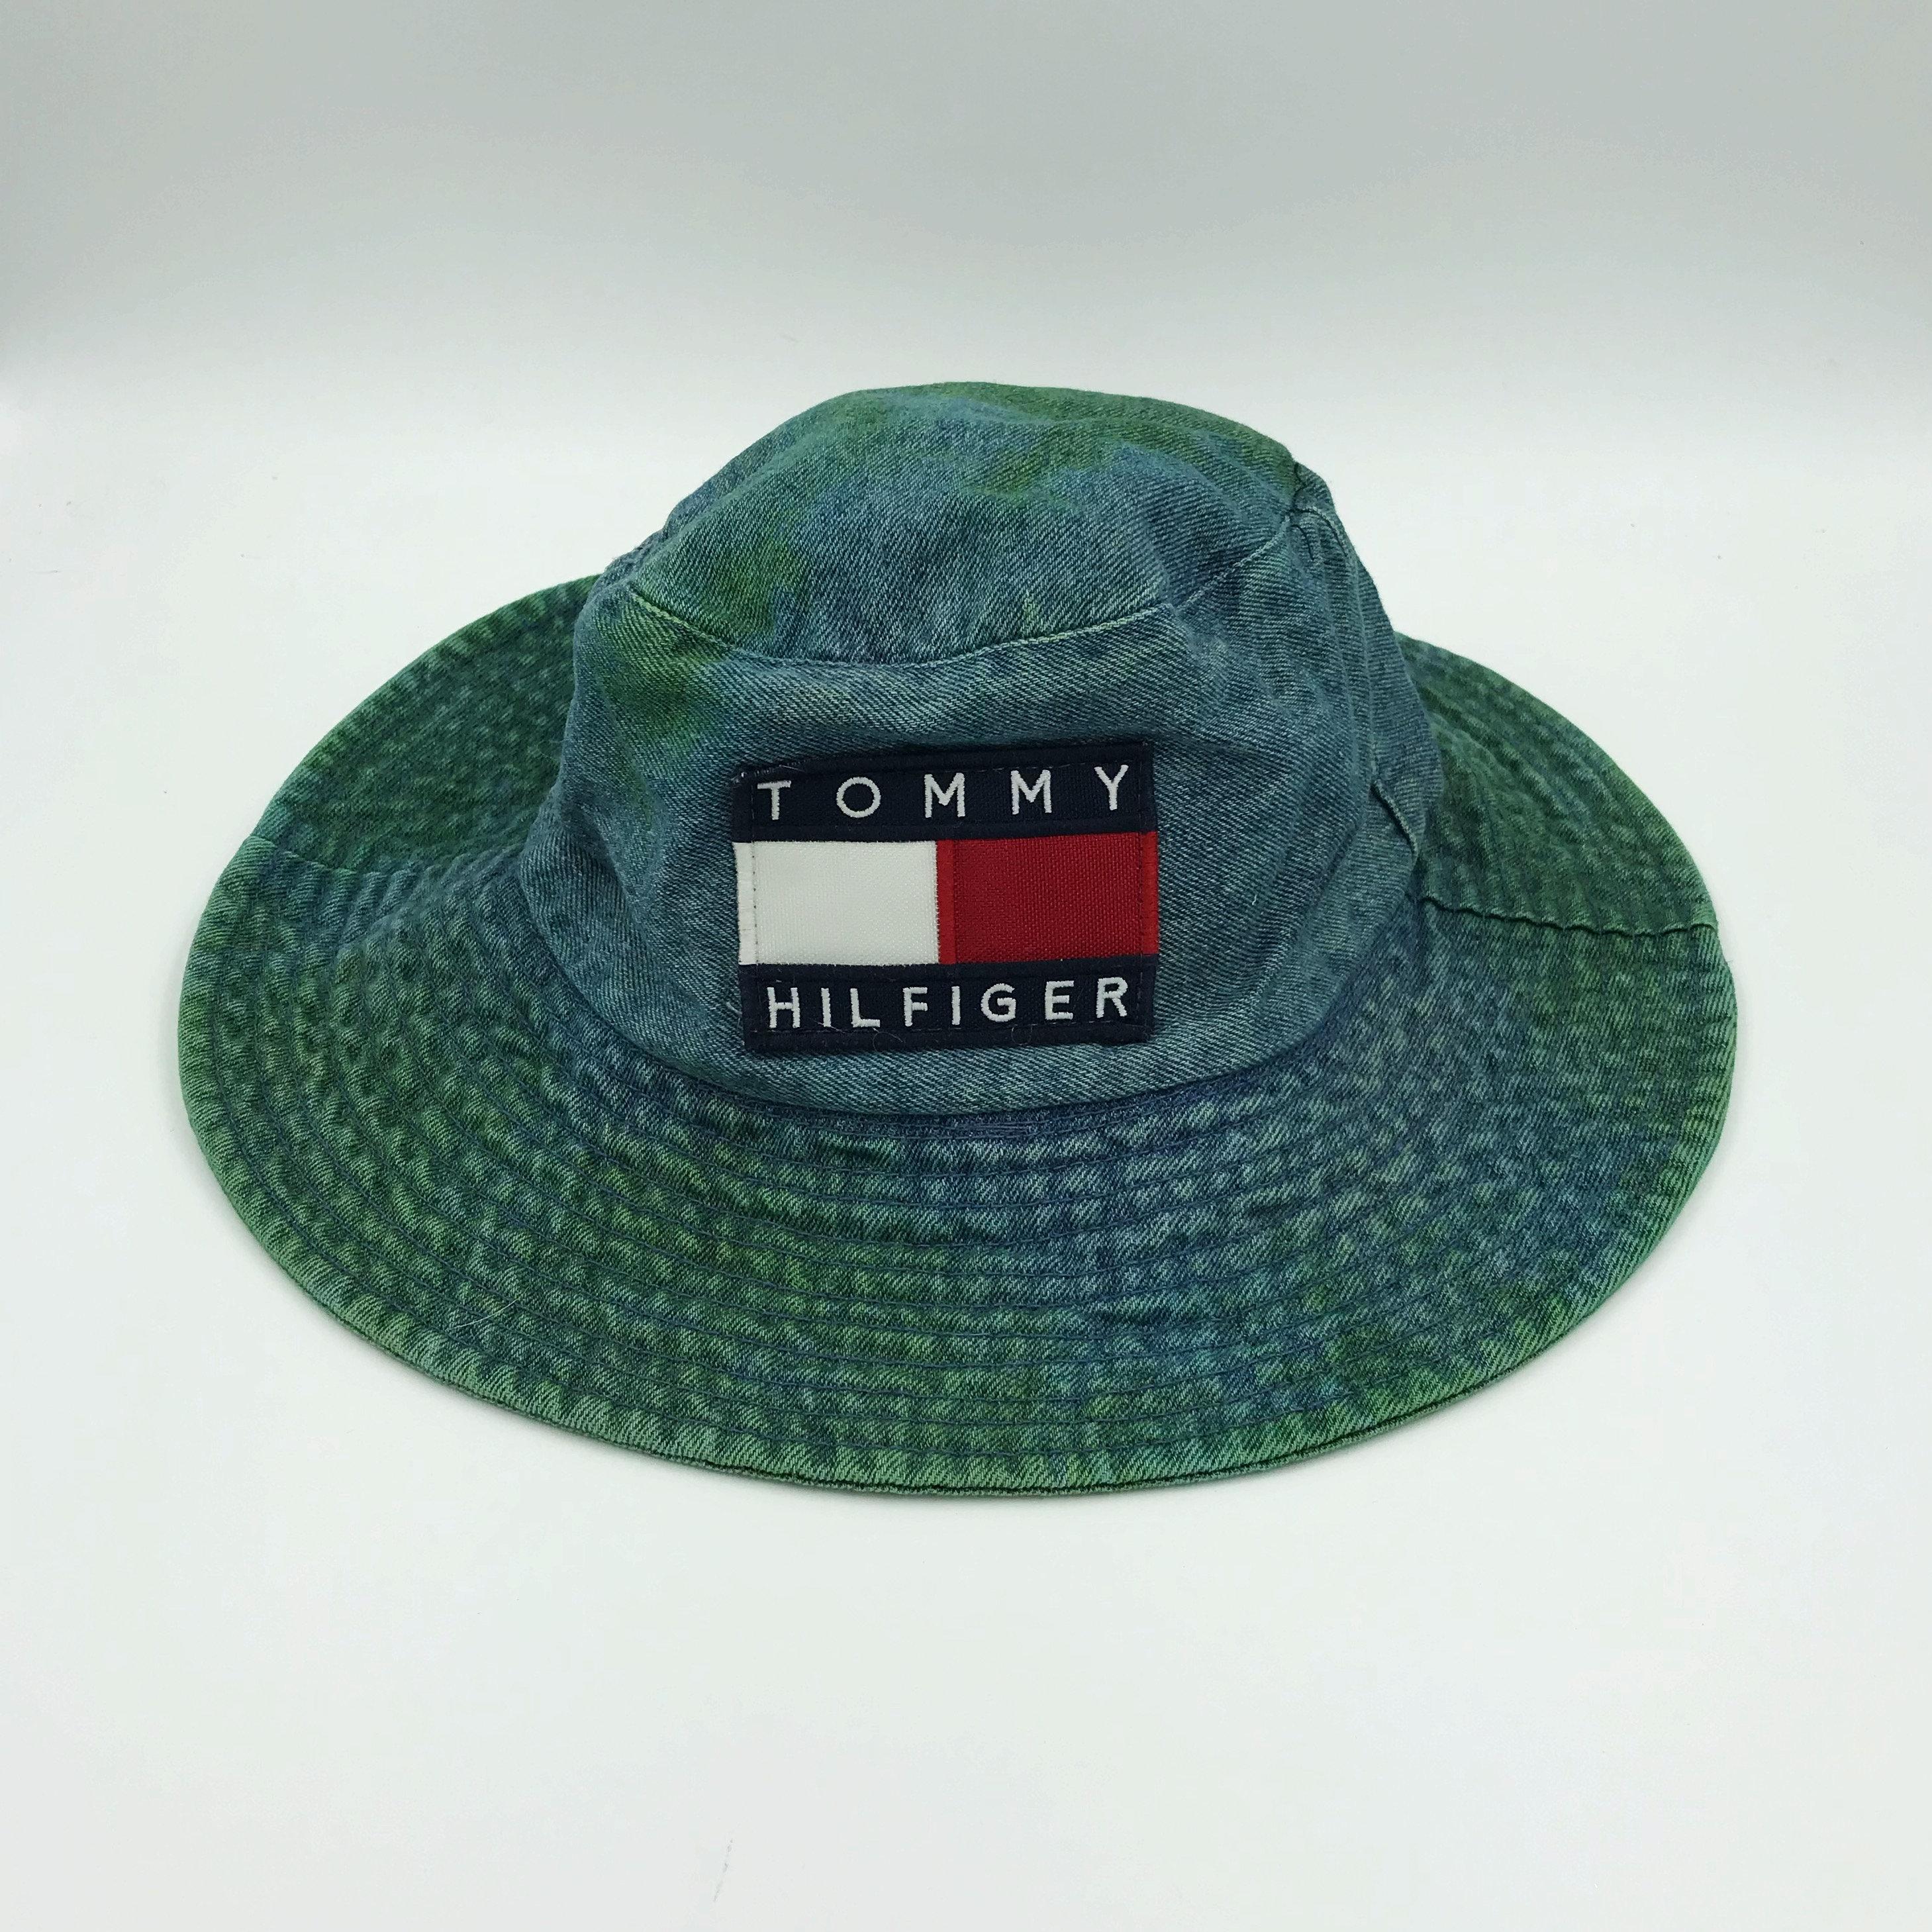 0fe6419d Tommy Hilfiger Patch Denim Bucket Sun Hat - Tie Dye Acid Wash ...